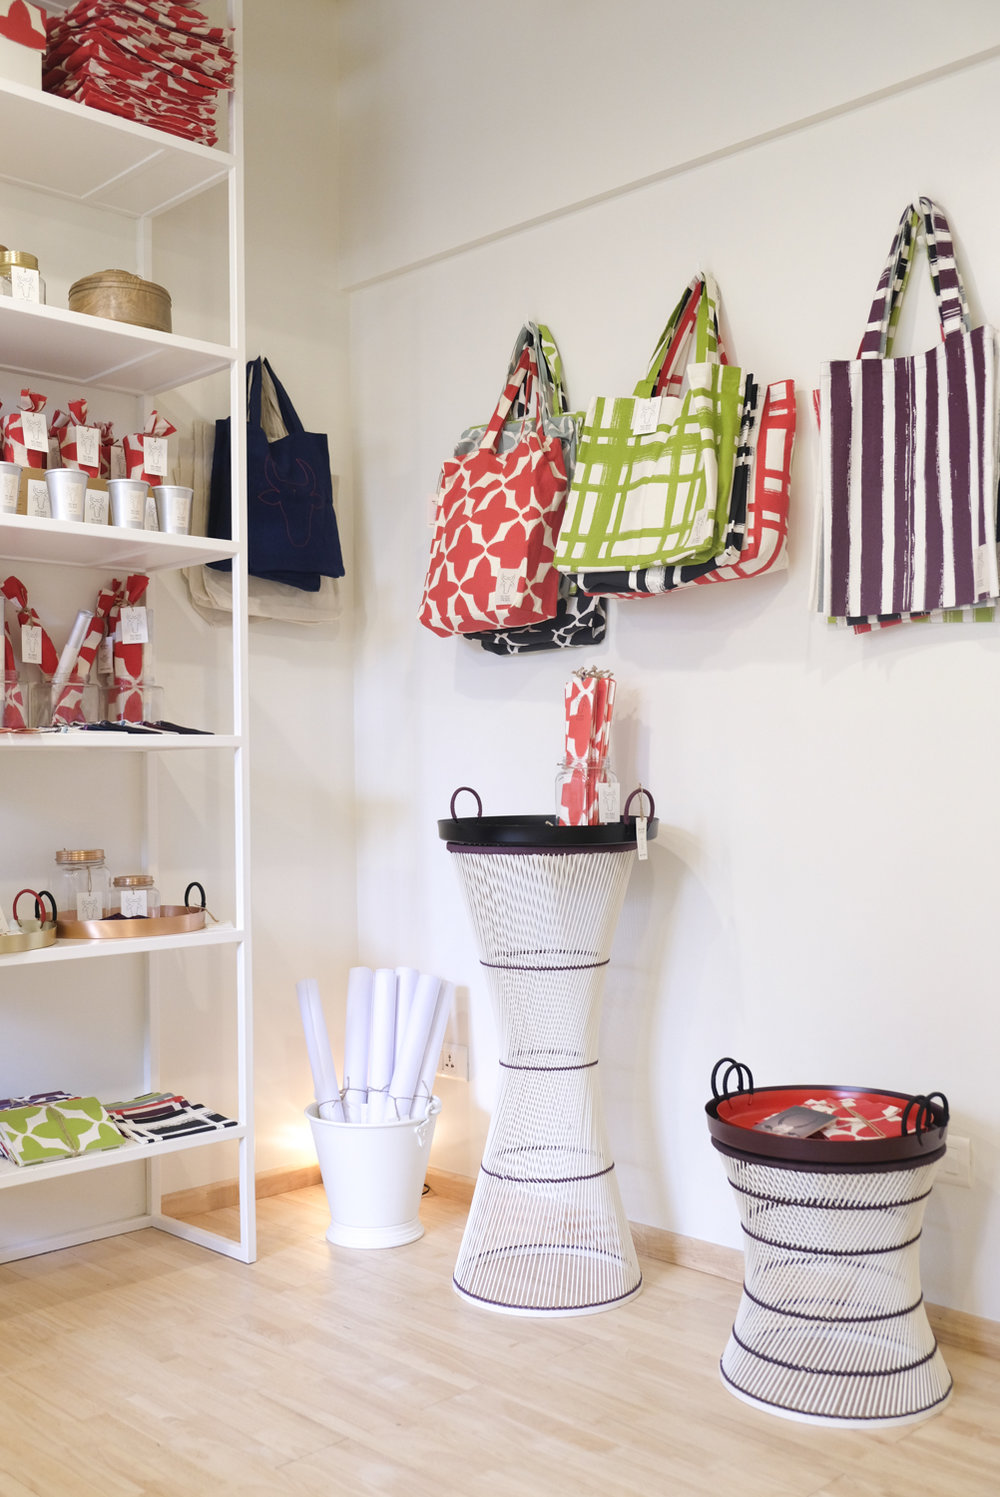 No-Mad fabric shop -5330.jpg